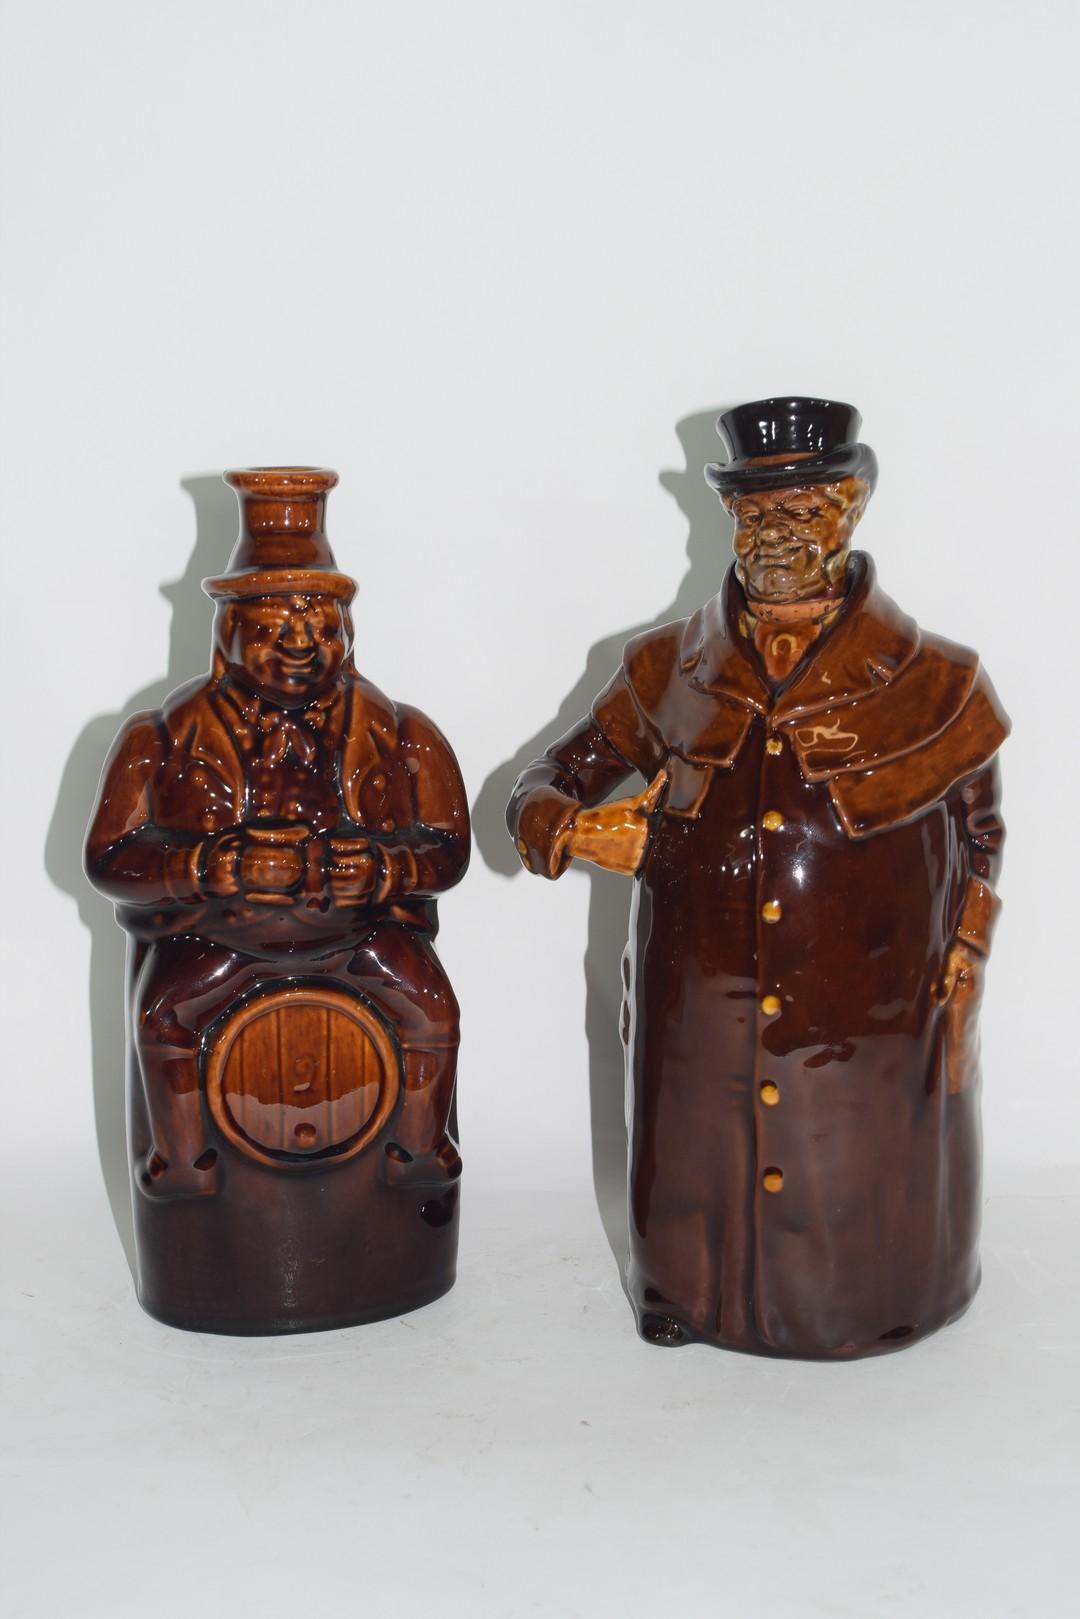 Royal Doulton Kingsware flask